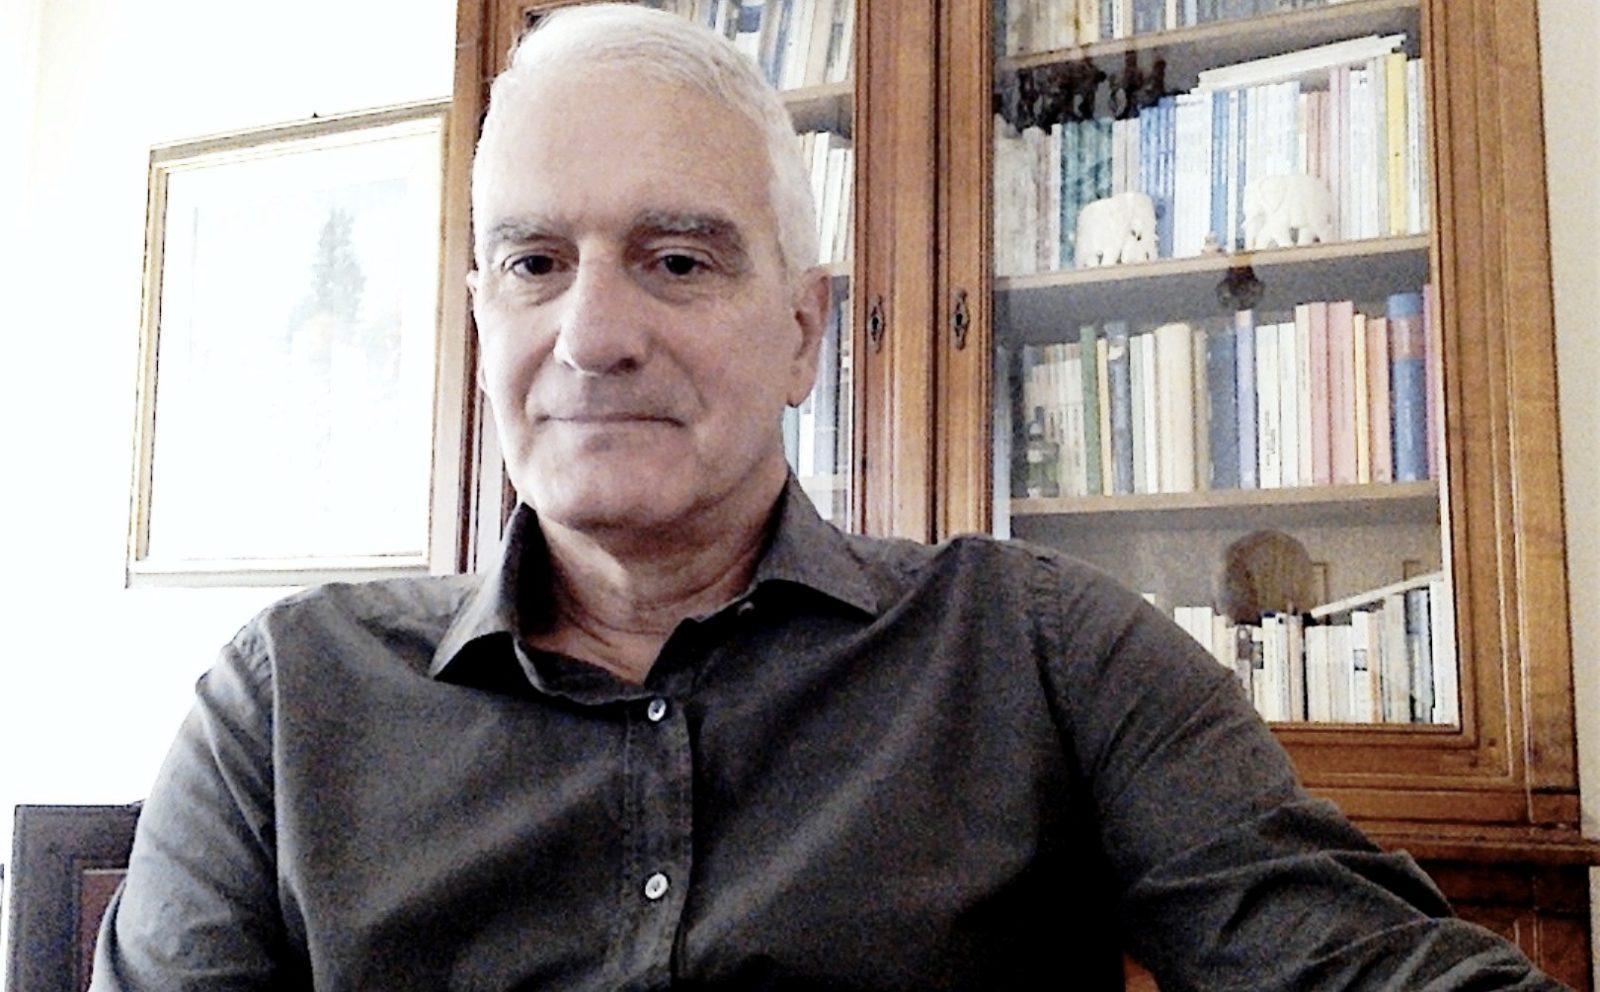 Nicola Ghezzani intervista luigi carotenuto